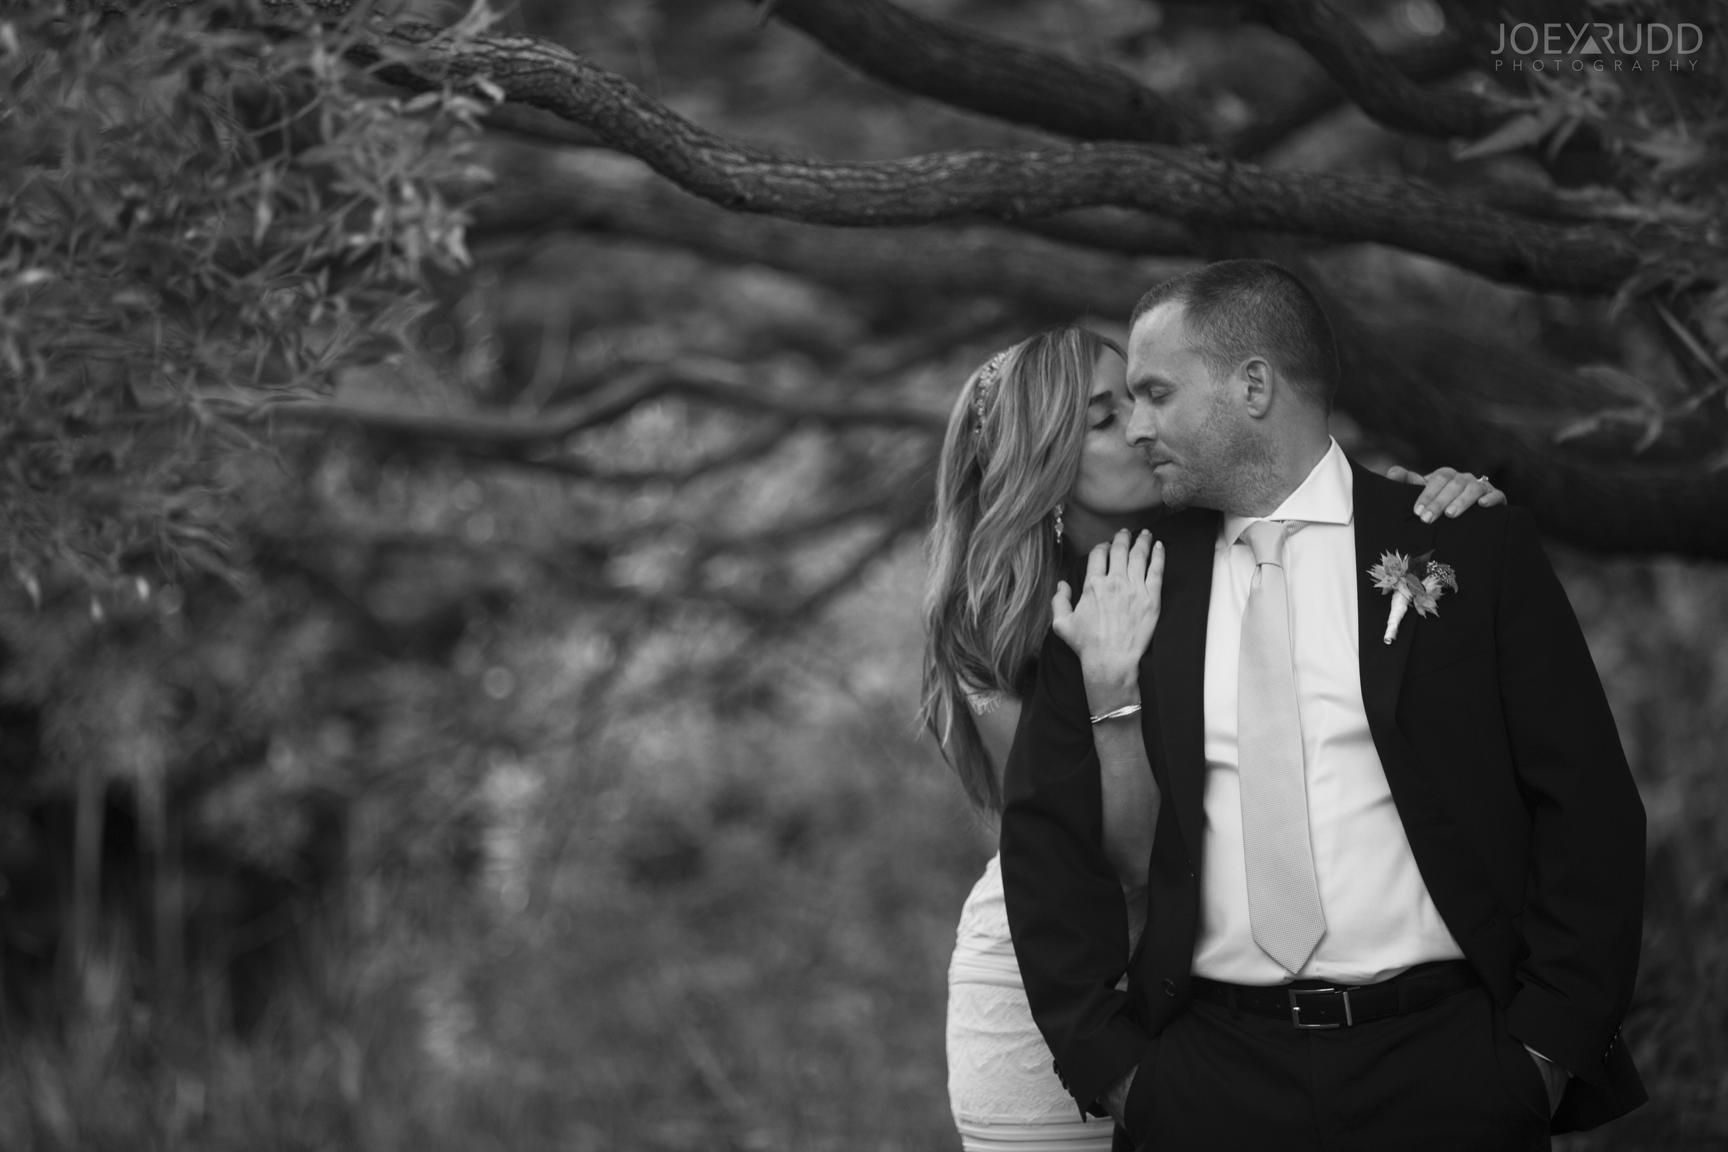 Elopement Wedding by Ottawa Wedding Photographer Joey Rudd Photography Arboretum Nature Trees